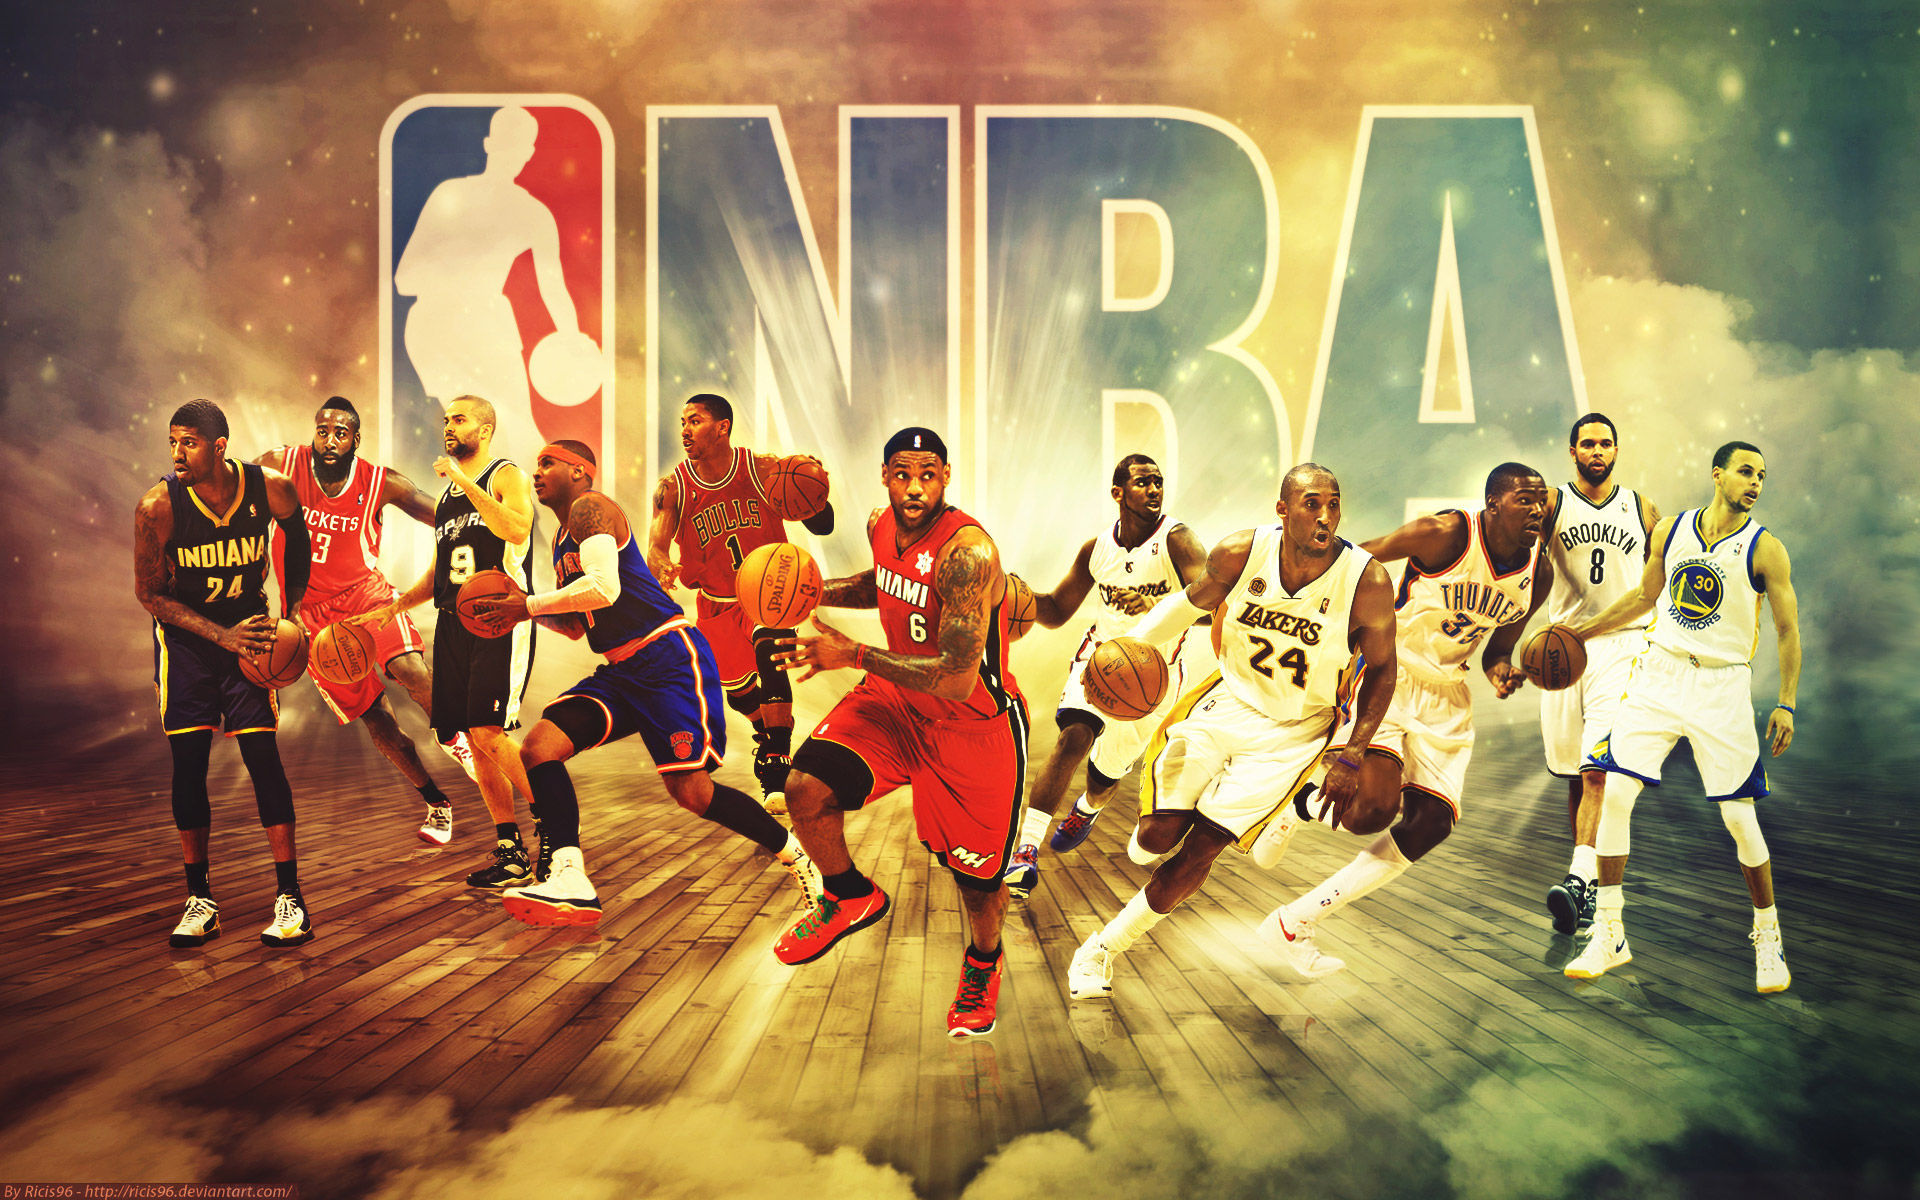 3556 - ¿Qué estrella de la NBA eres?